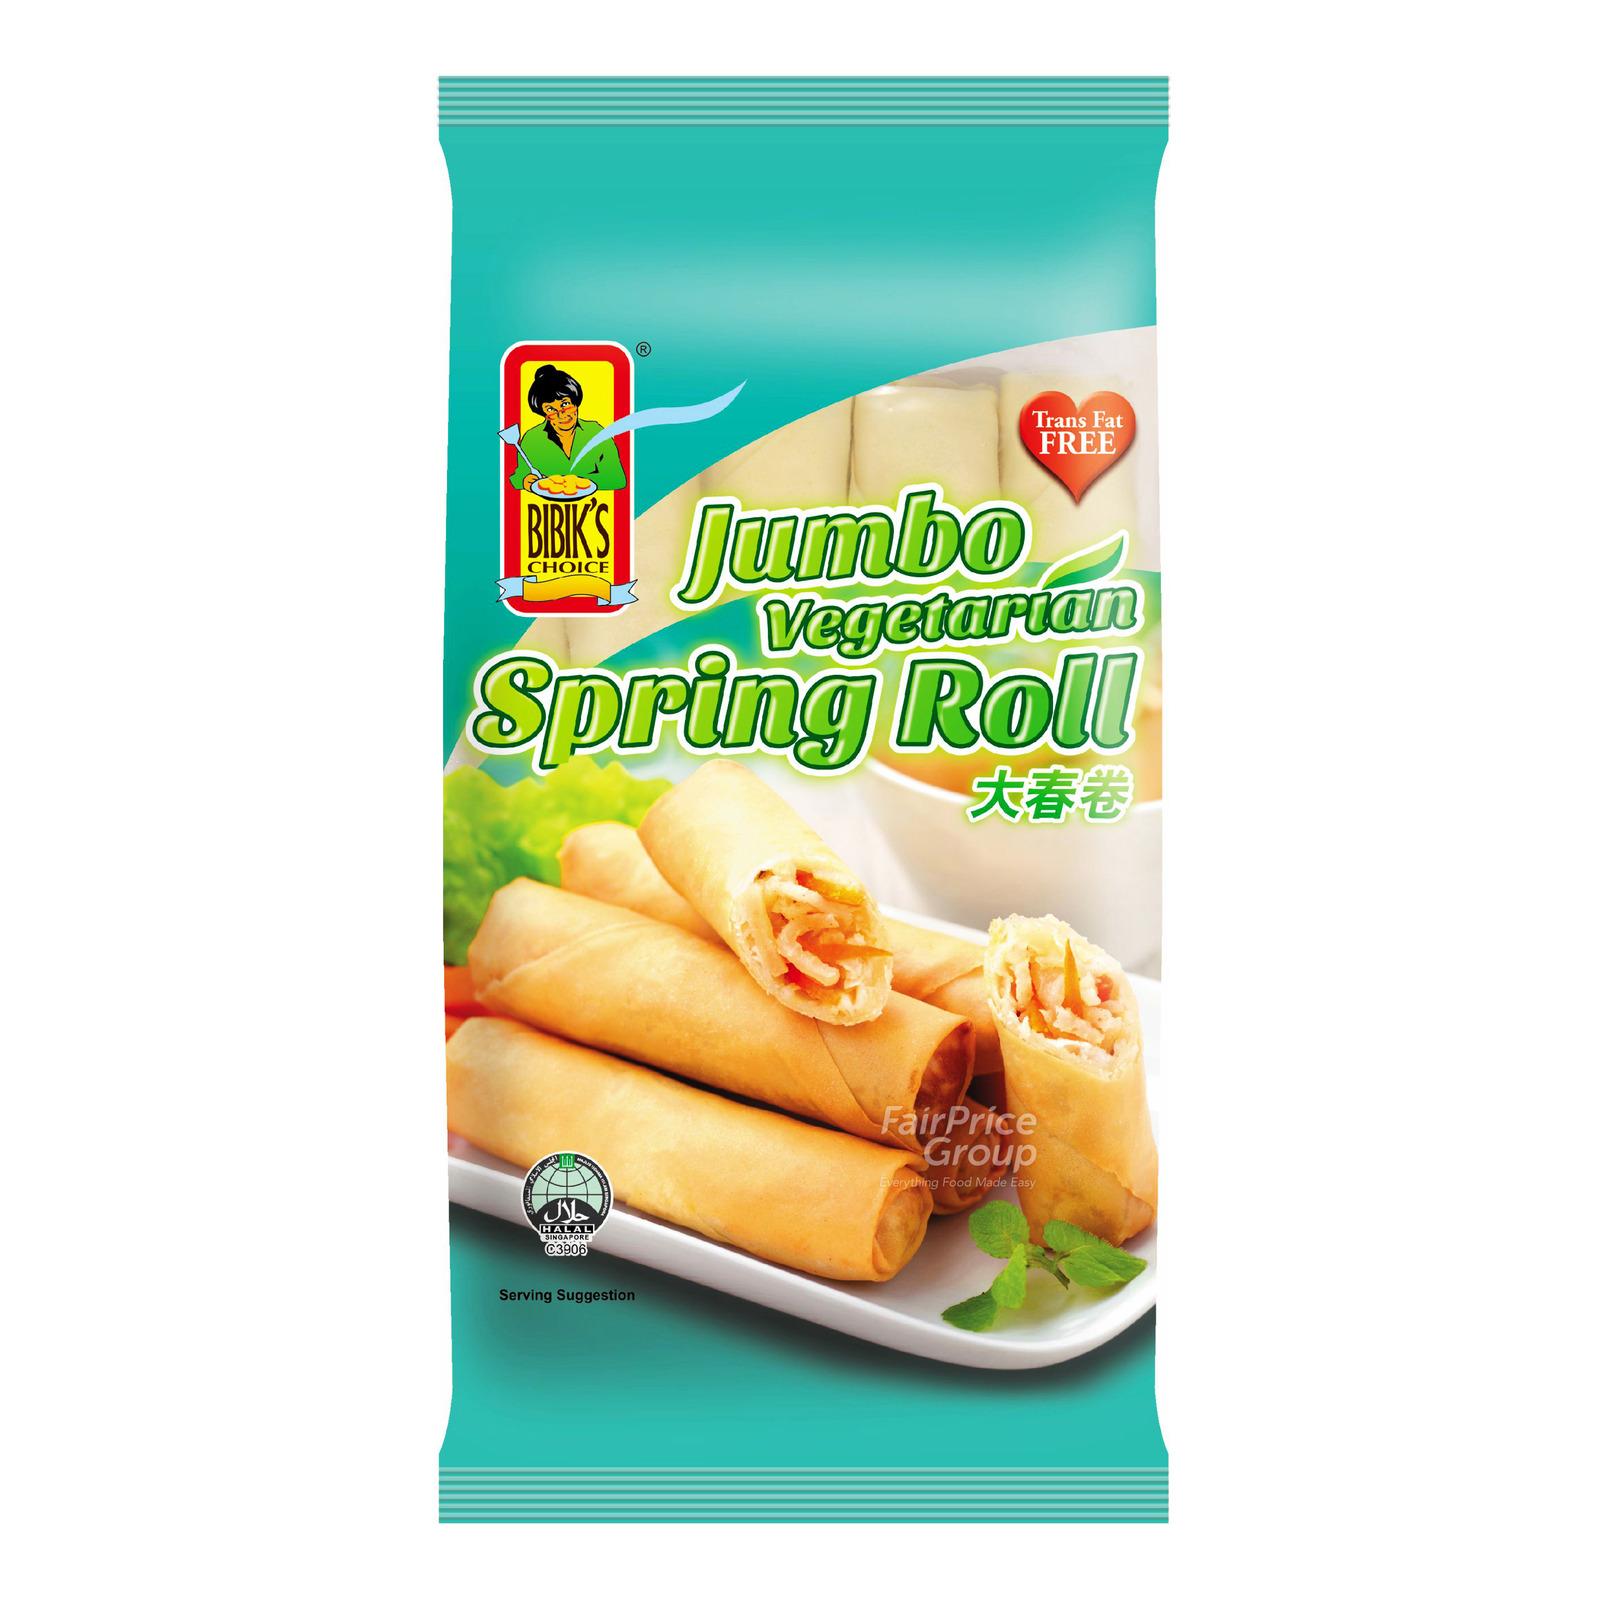 Bibik's Choice Spring Roll - Jumbo